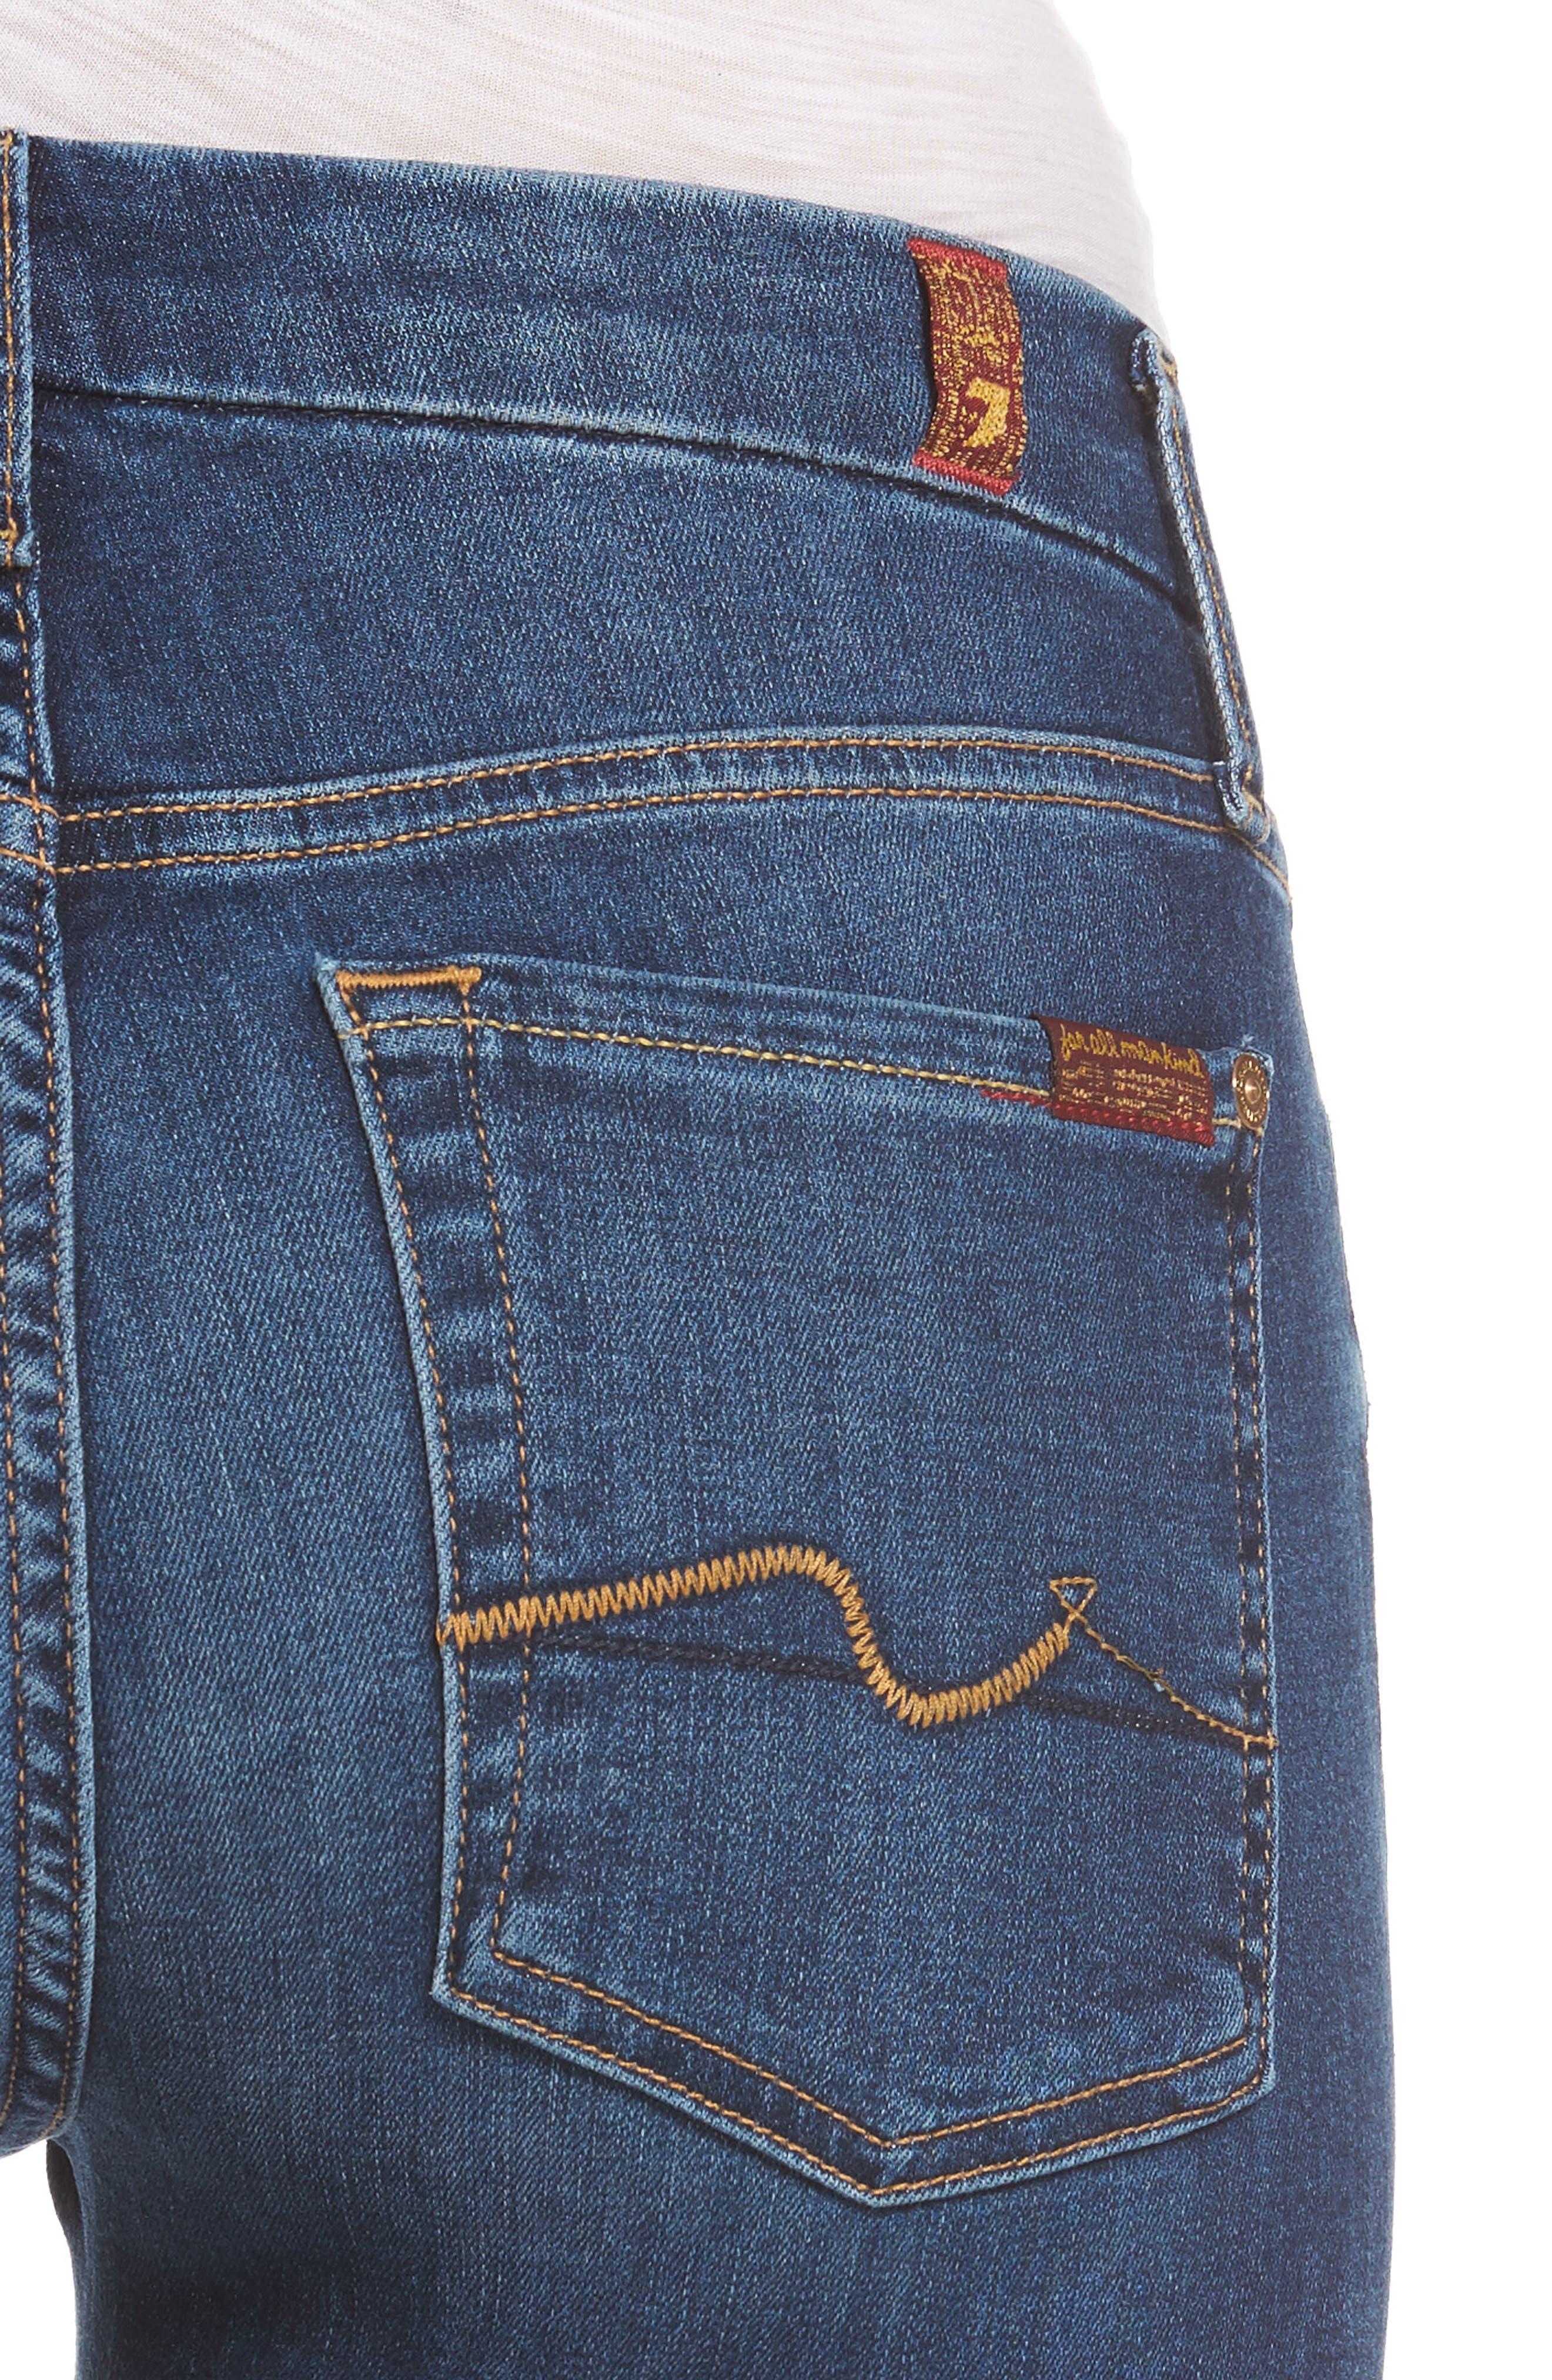 Kimmie Bootcut Jeans,                             Alternate thumbnail 4, color,                             400